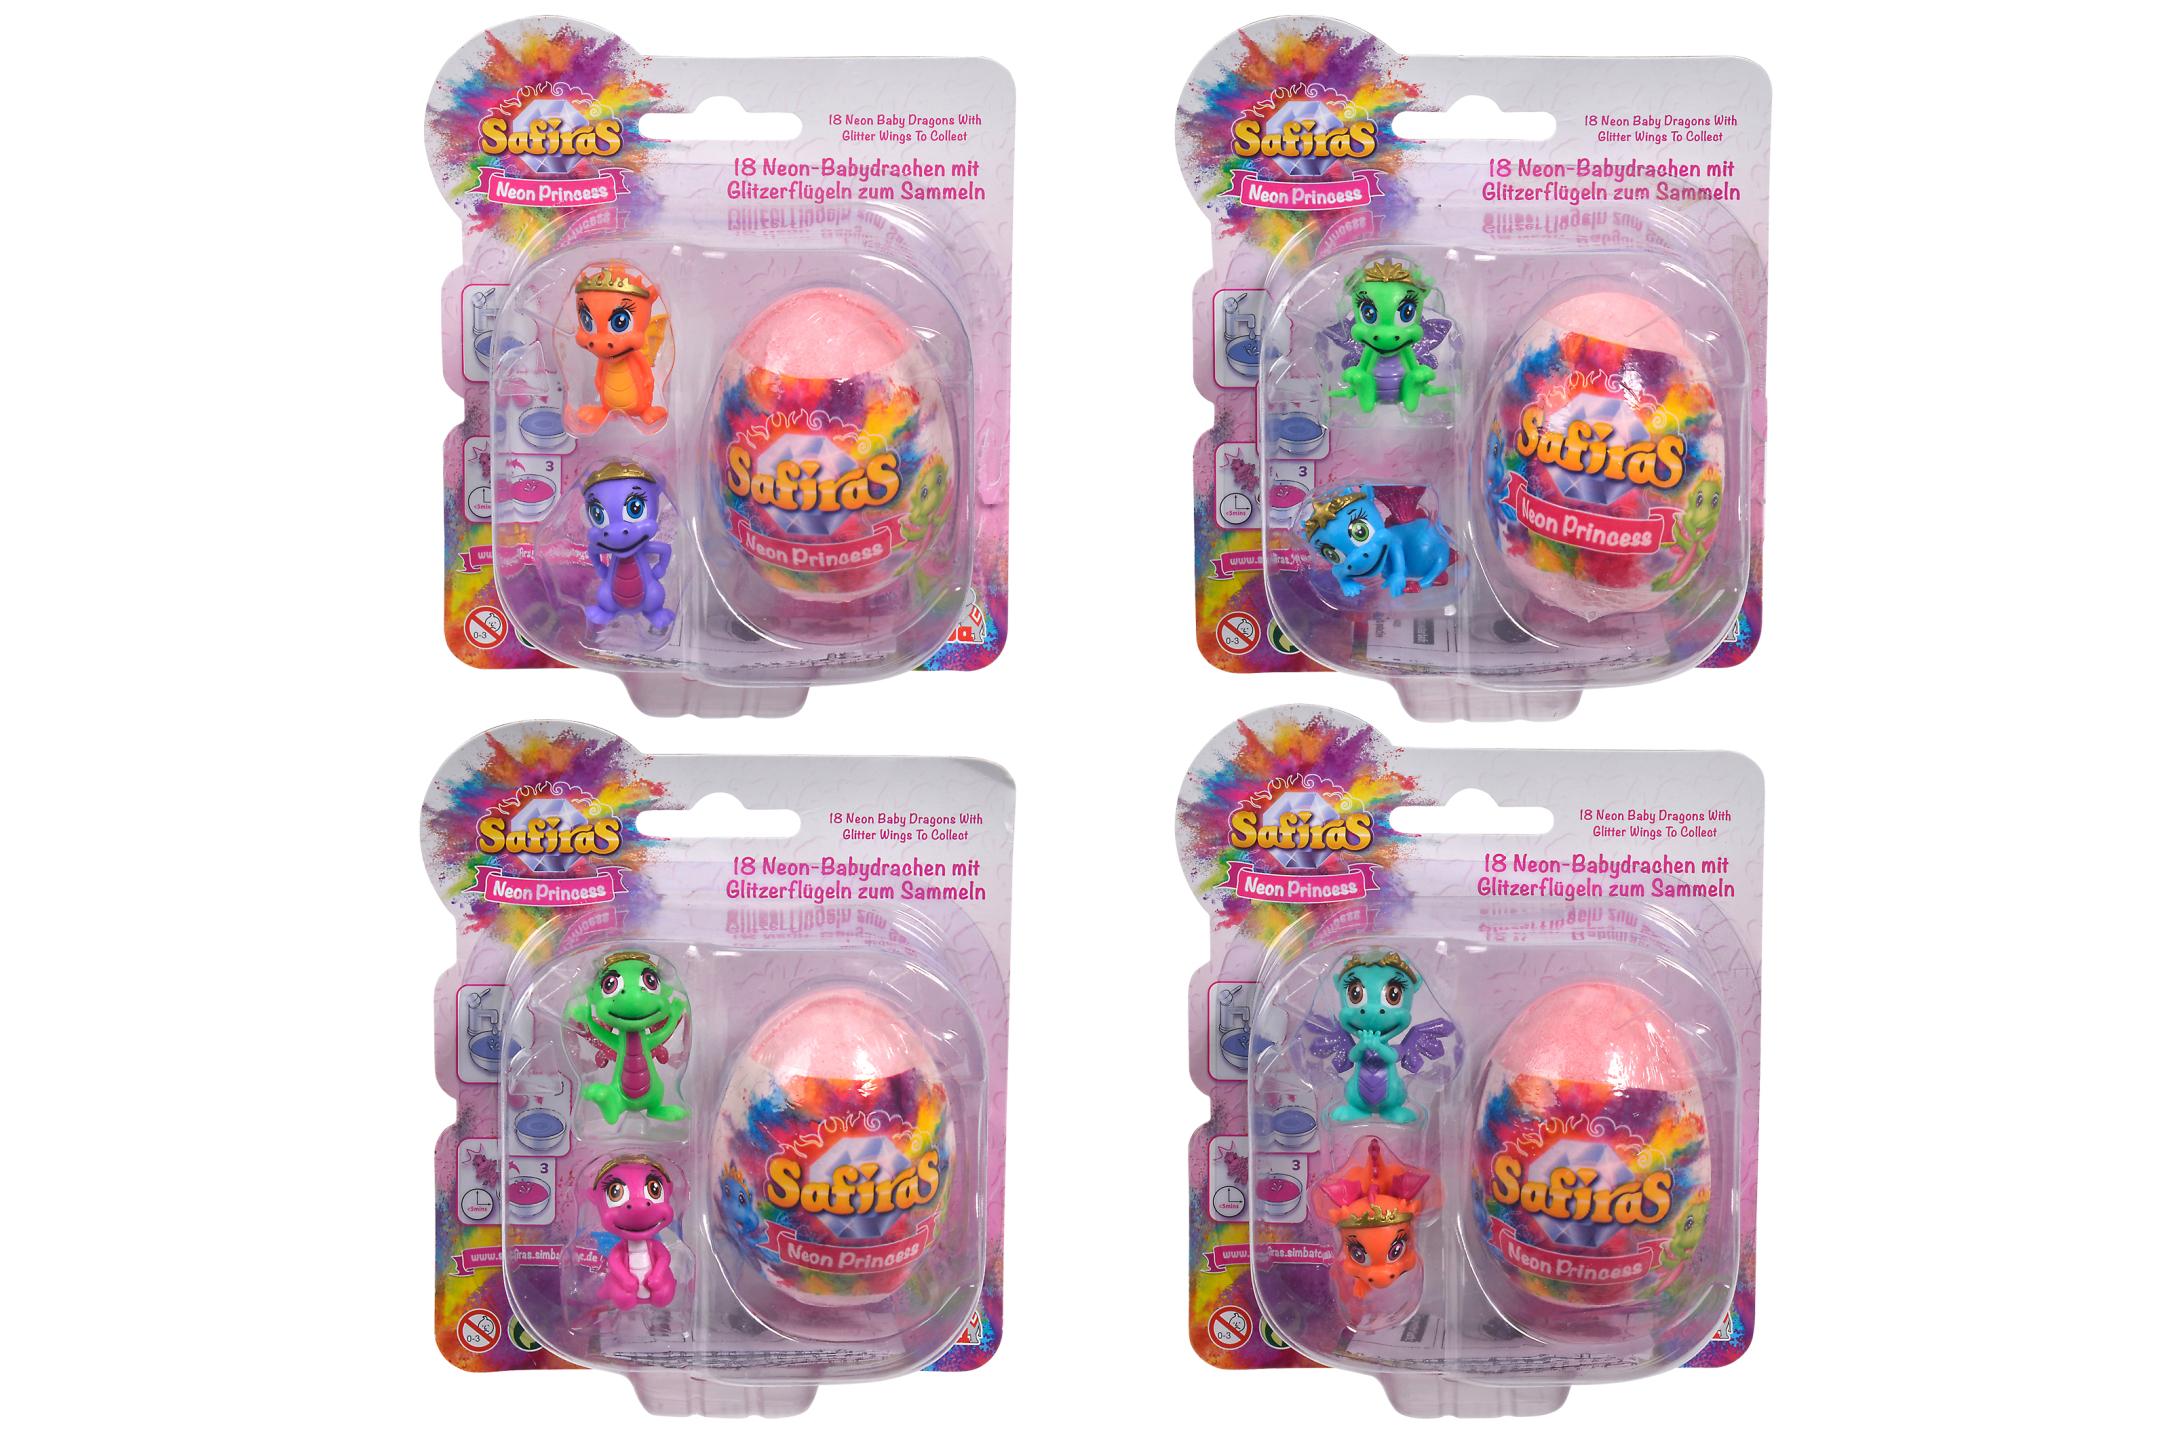 Safiras V Neon Princess 3er Pack